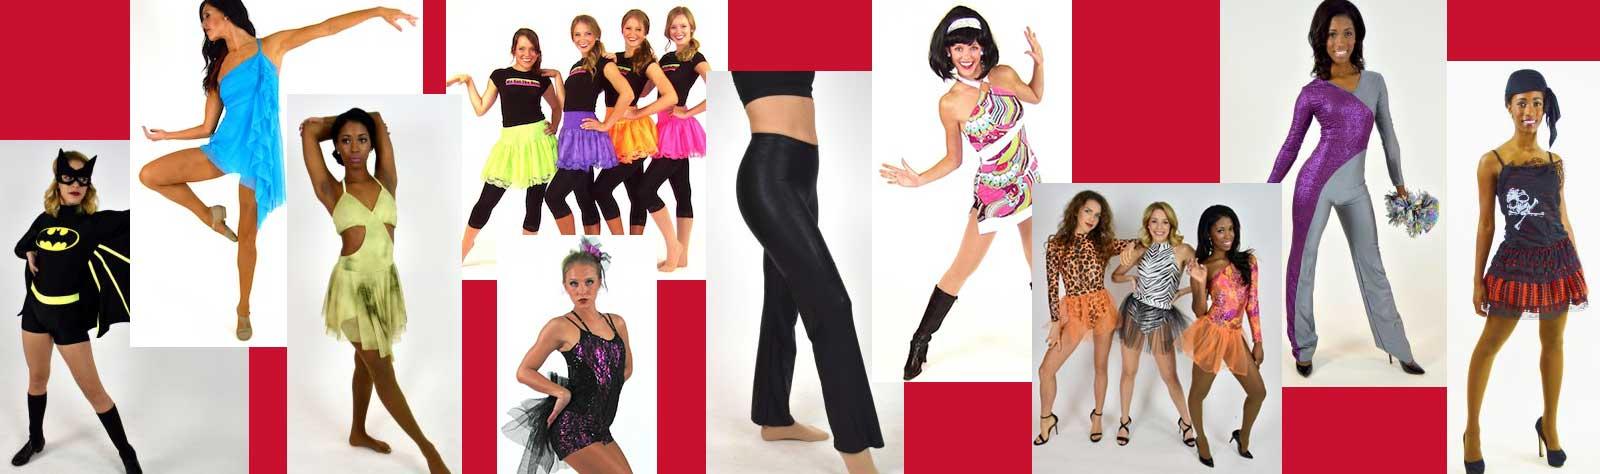 examples of sale items including batgirl costume dance dresses, leotards and black dance pants